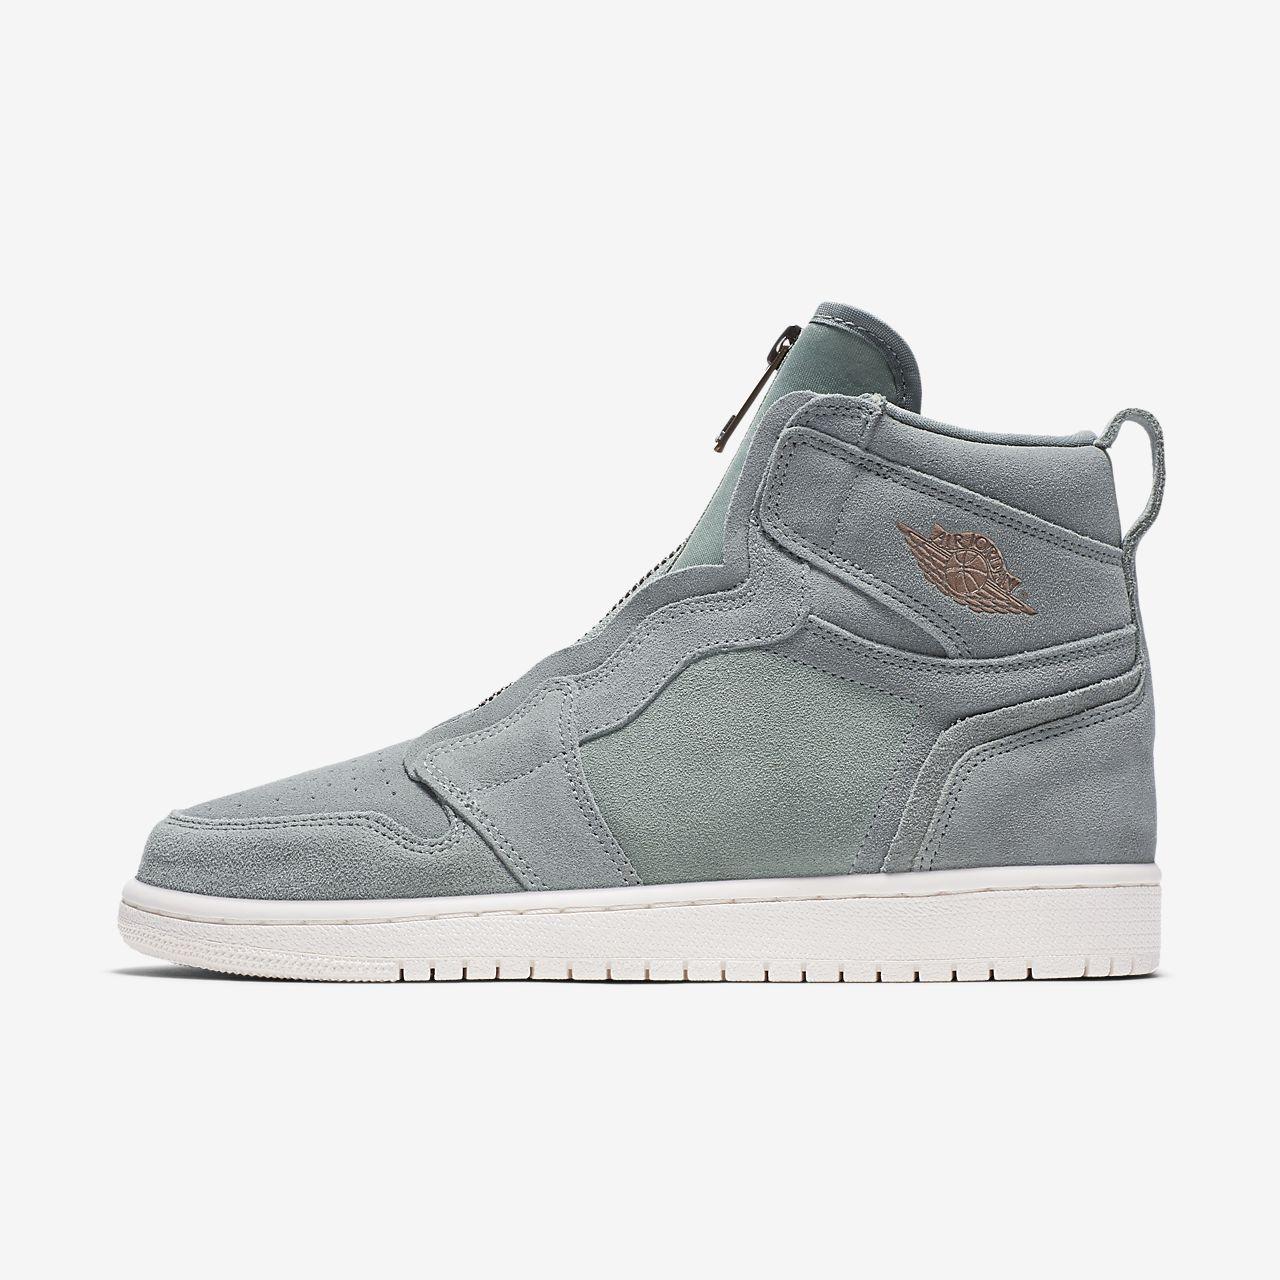 Dámská bota Air Jordan 1 High Zip